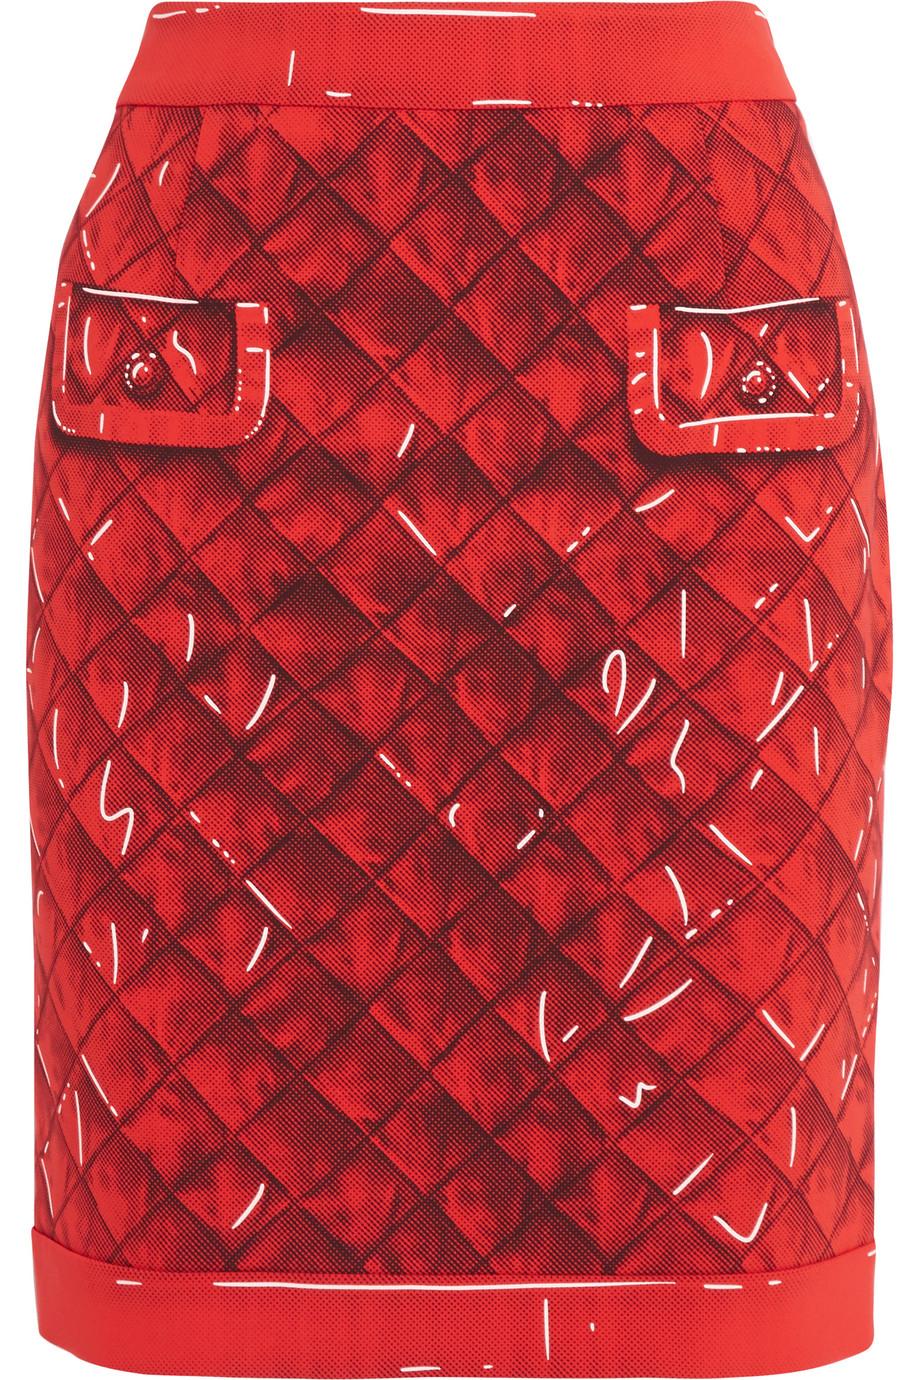 Moschino Printed Crepe Skirt, Red, Women's, Size: 44